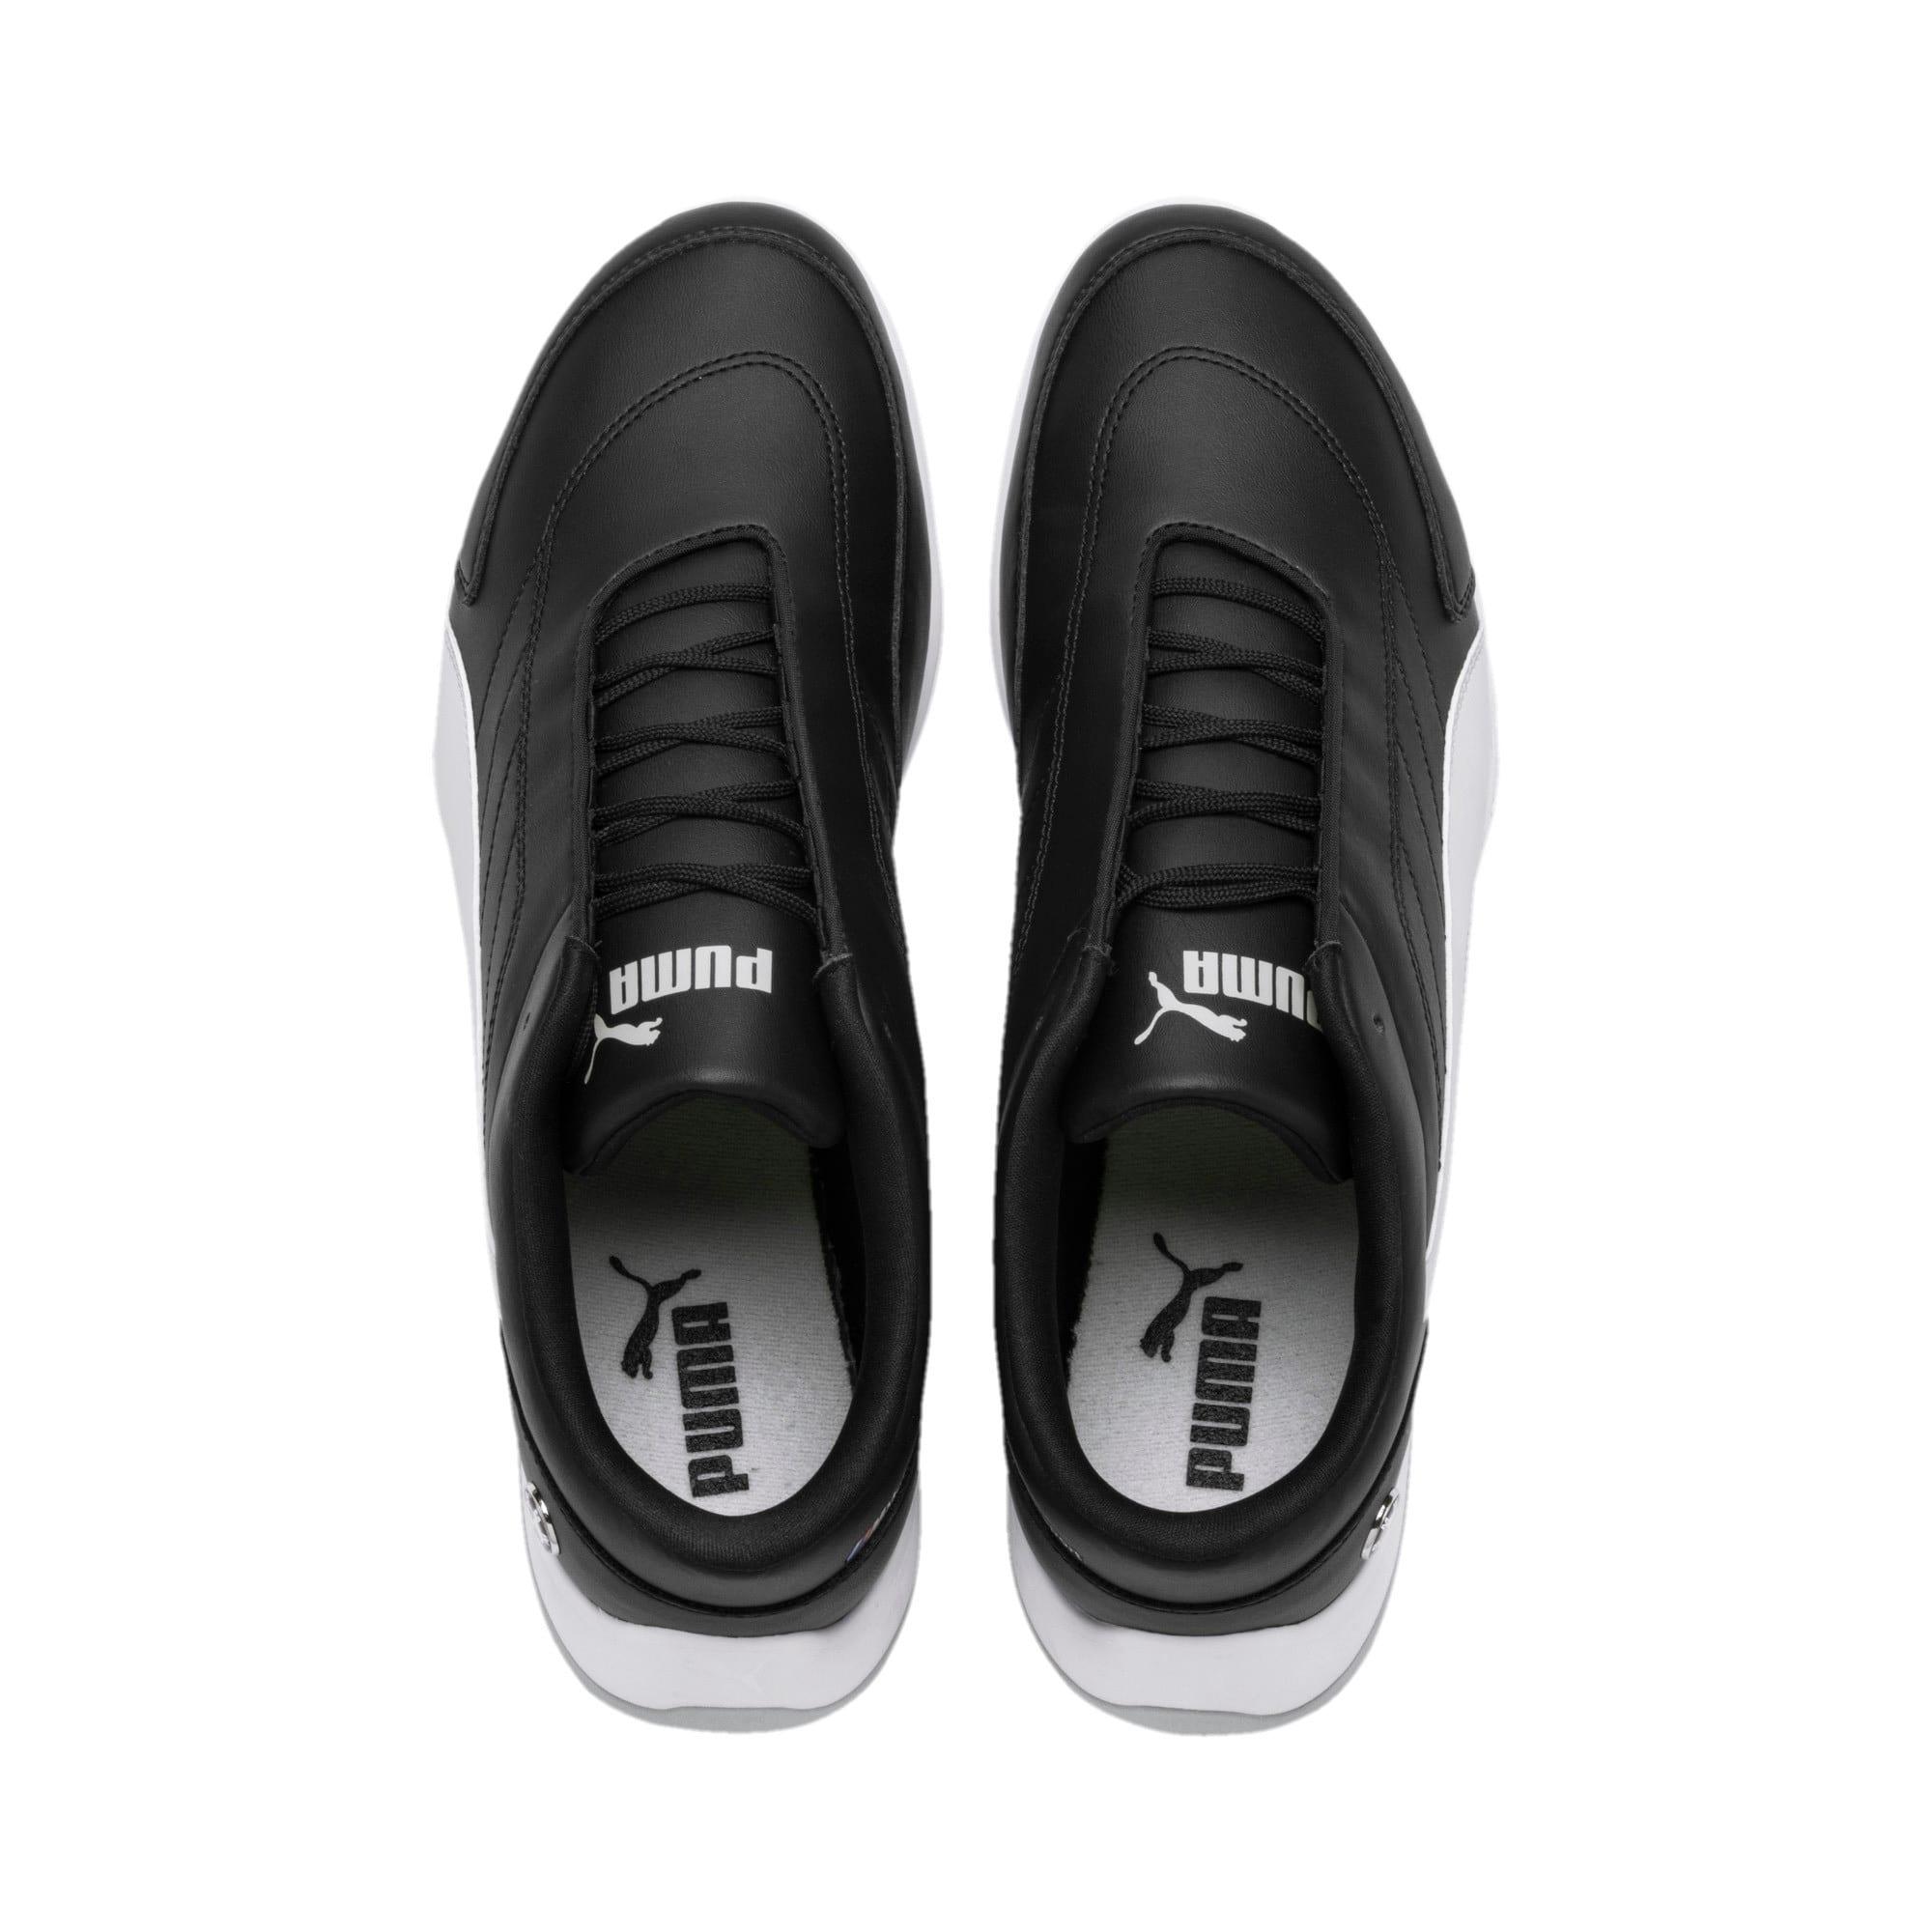 Thumbnail 7 of BMW M Motorsport Kart Cat III Shoes, Puma Black-Gray Violet, medium